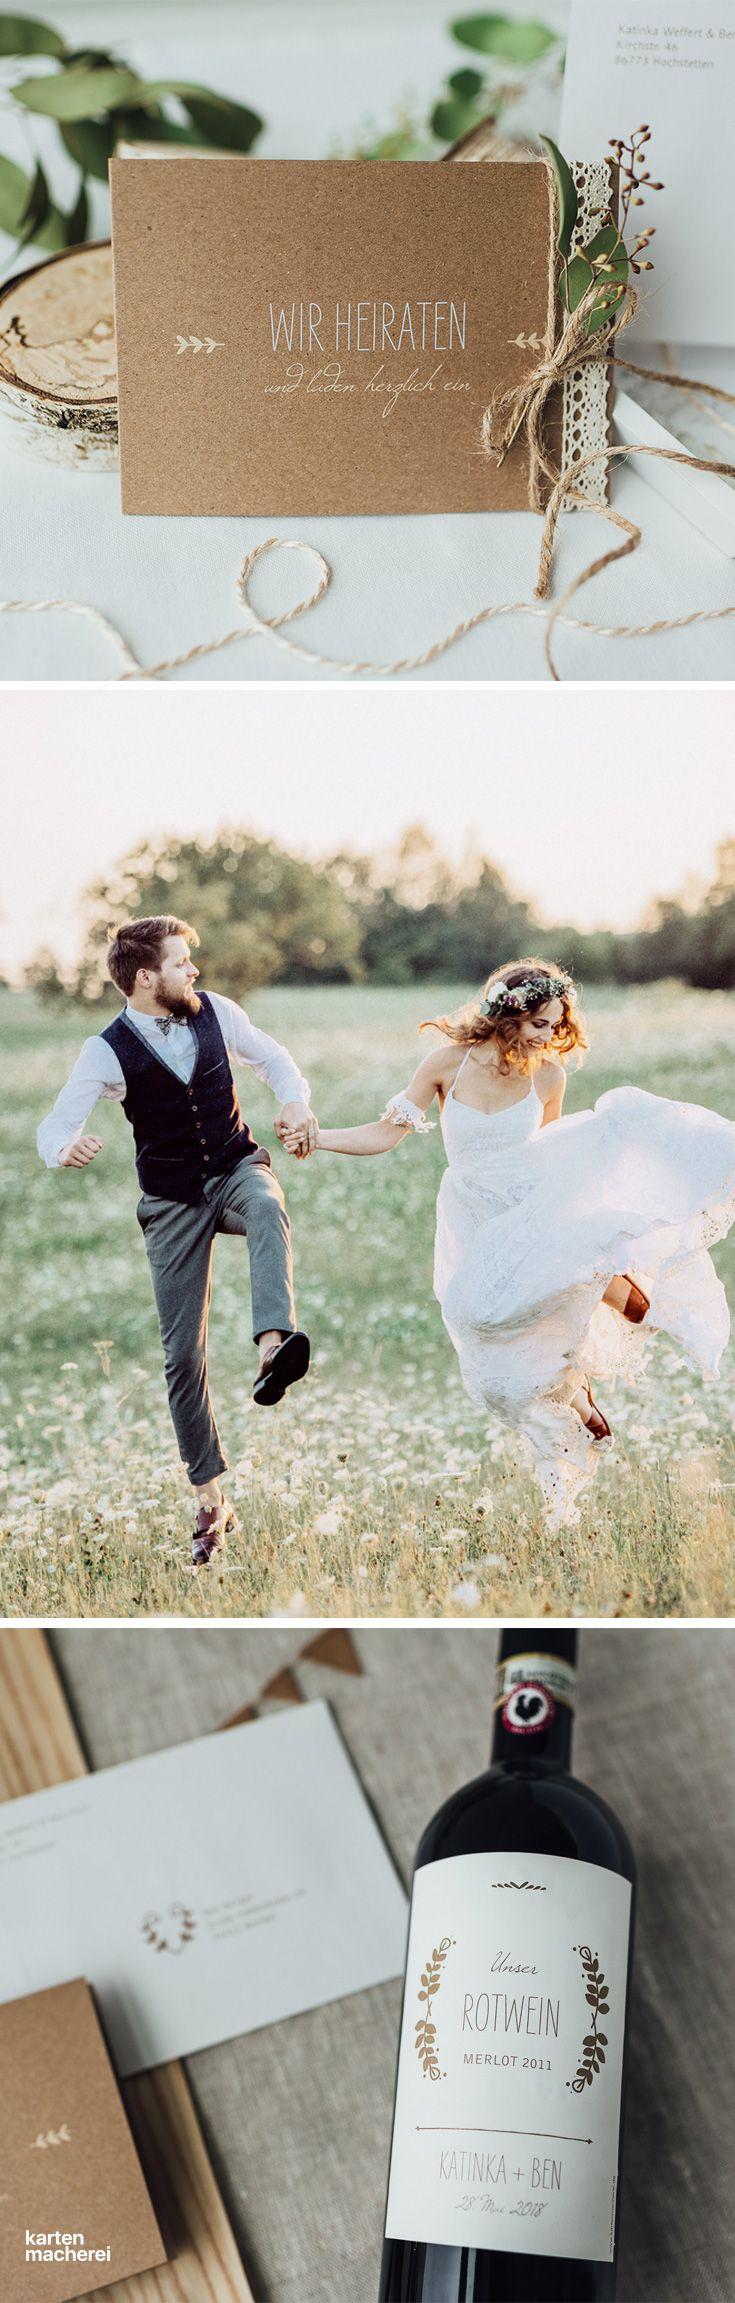 52 best Hochzeit | Frühling images on Pinterest | Bijou, Colores ...